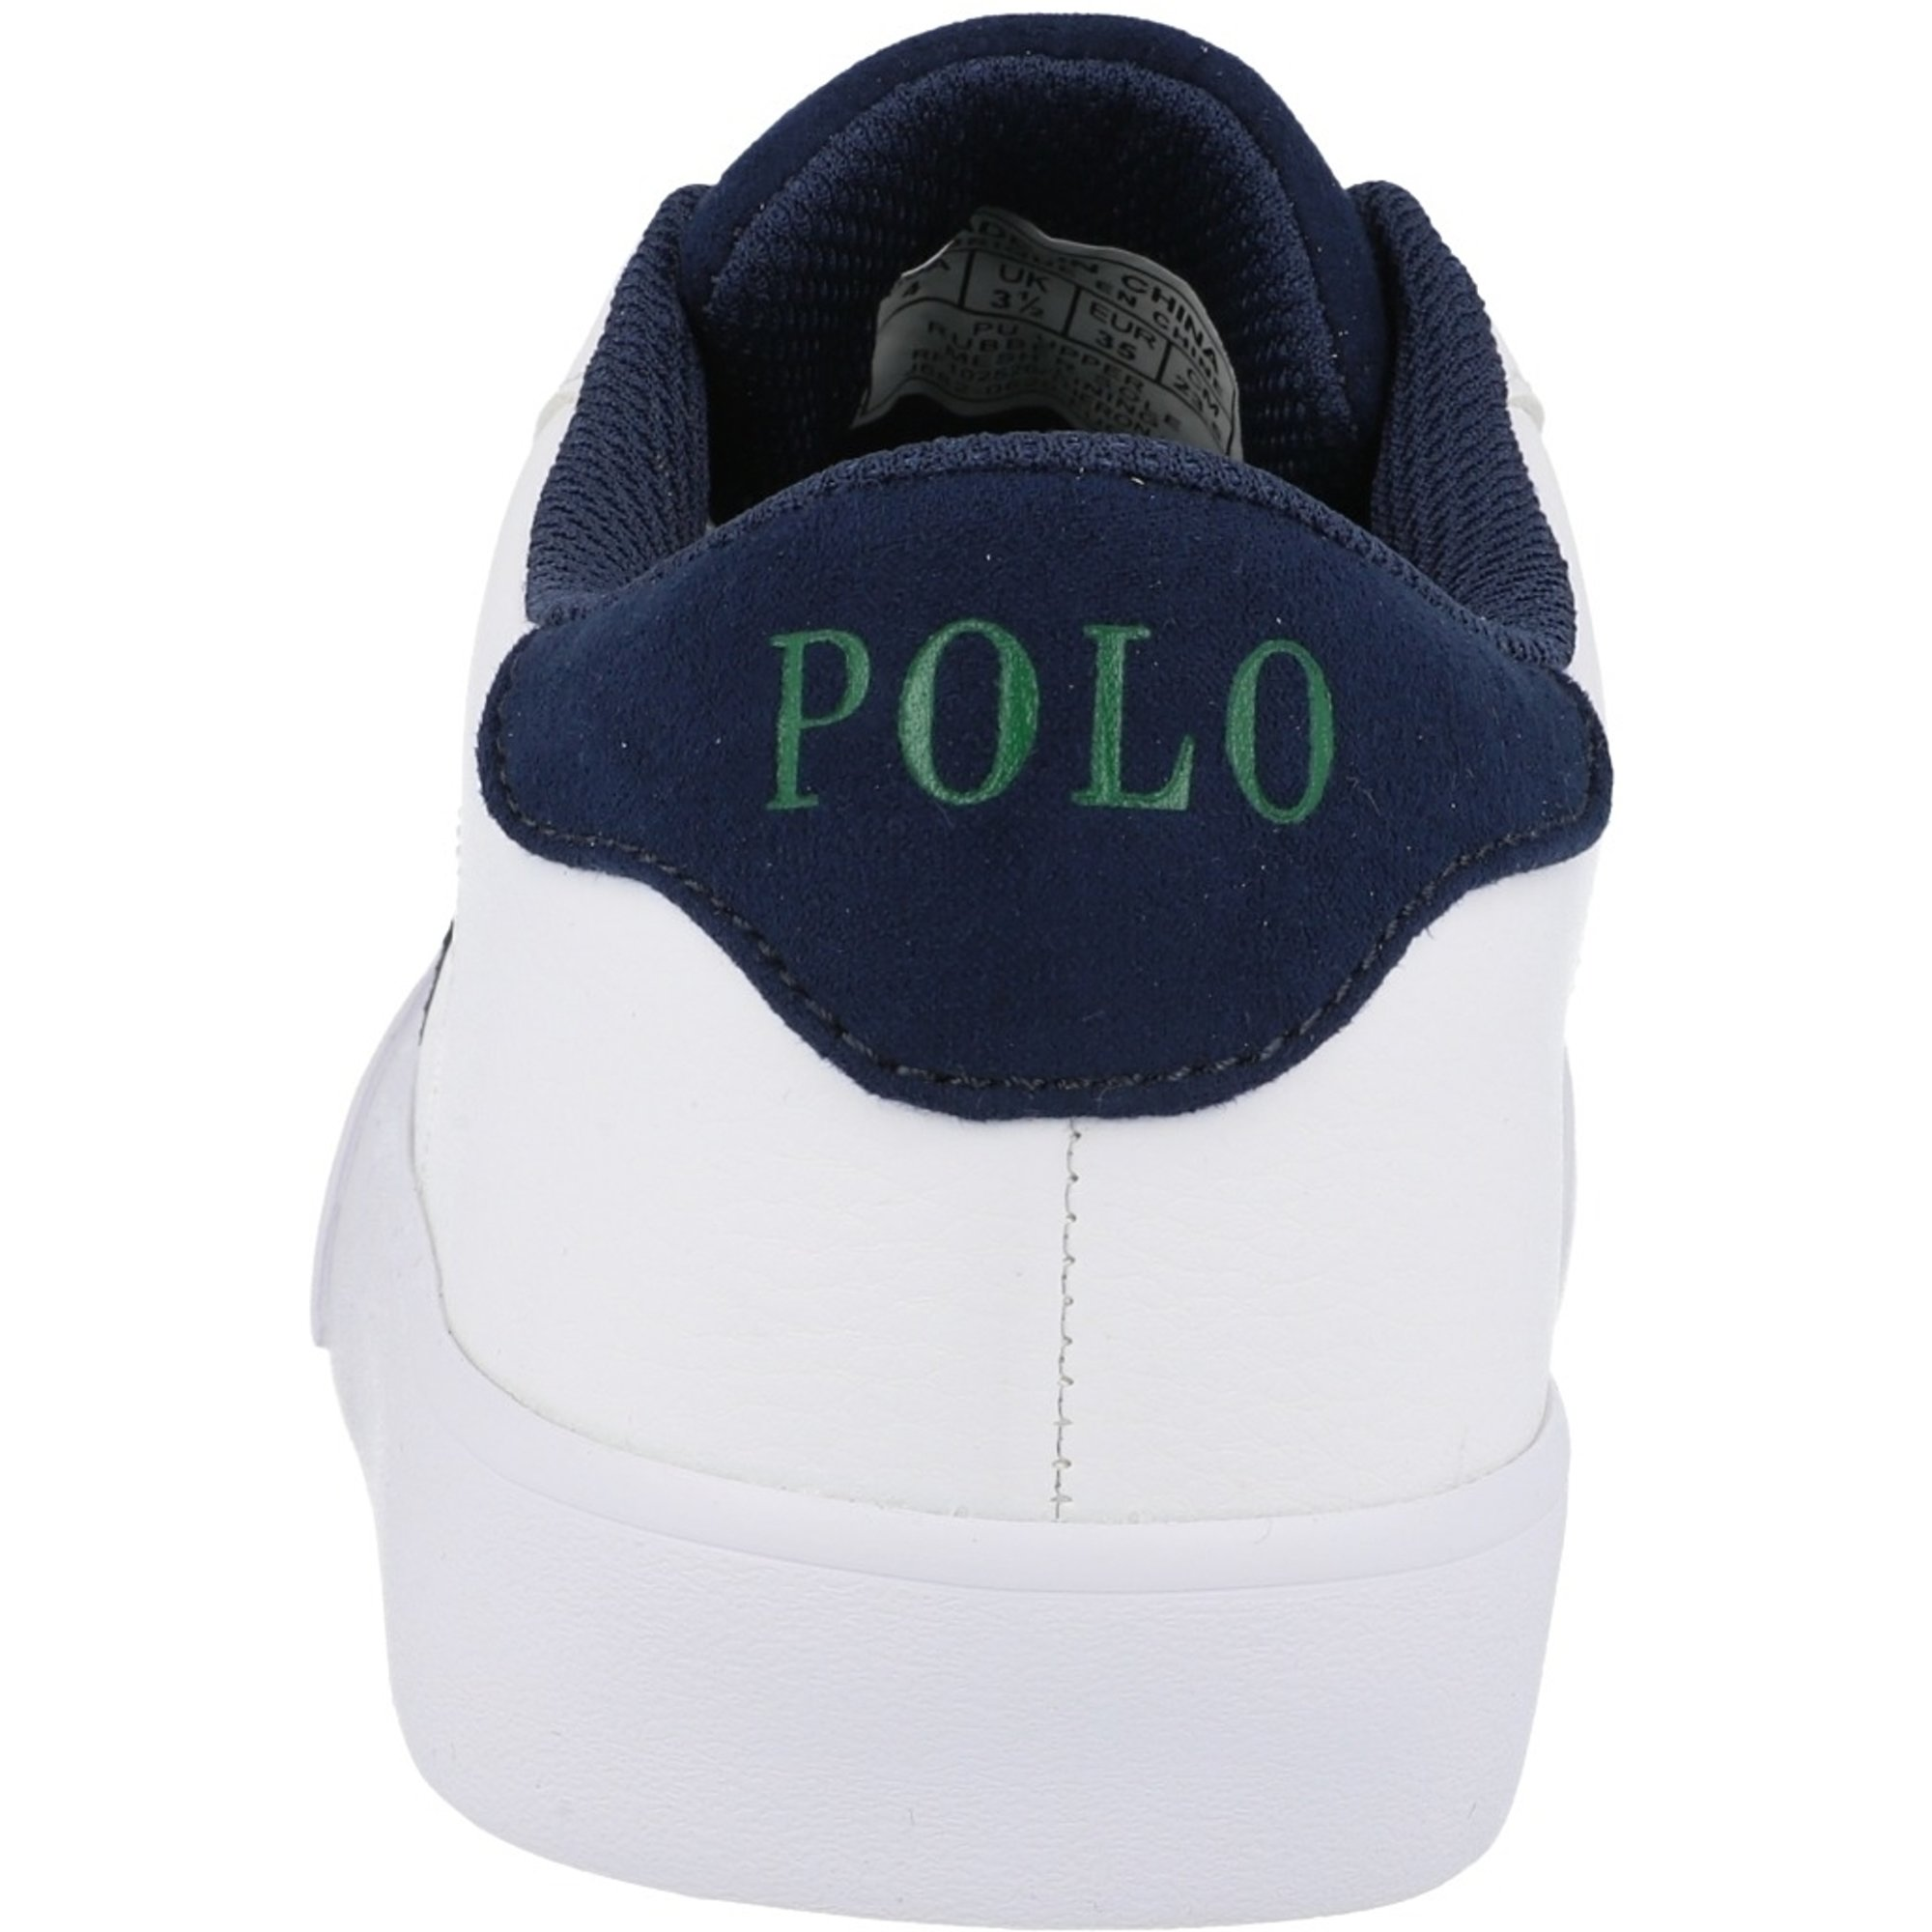 Polo Ralph Lauren Theron III J White/Navy Tumbled